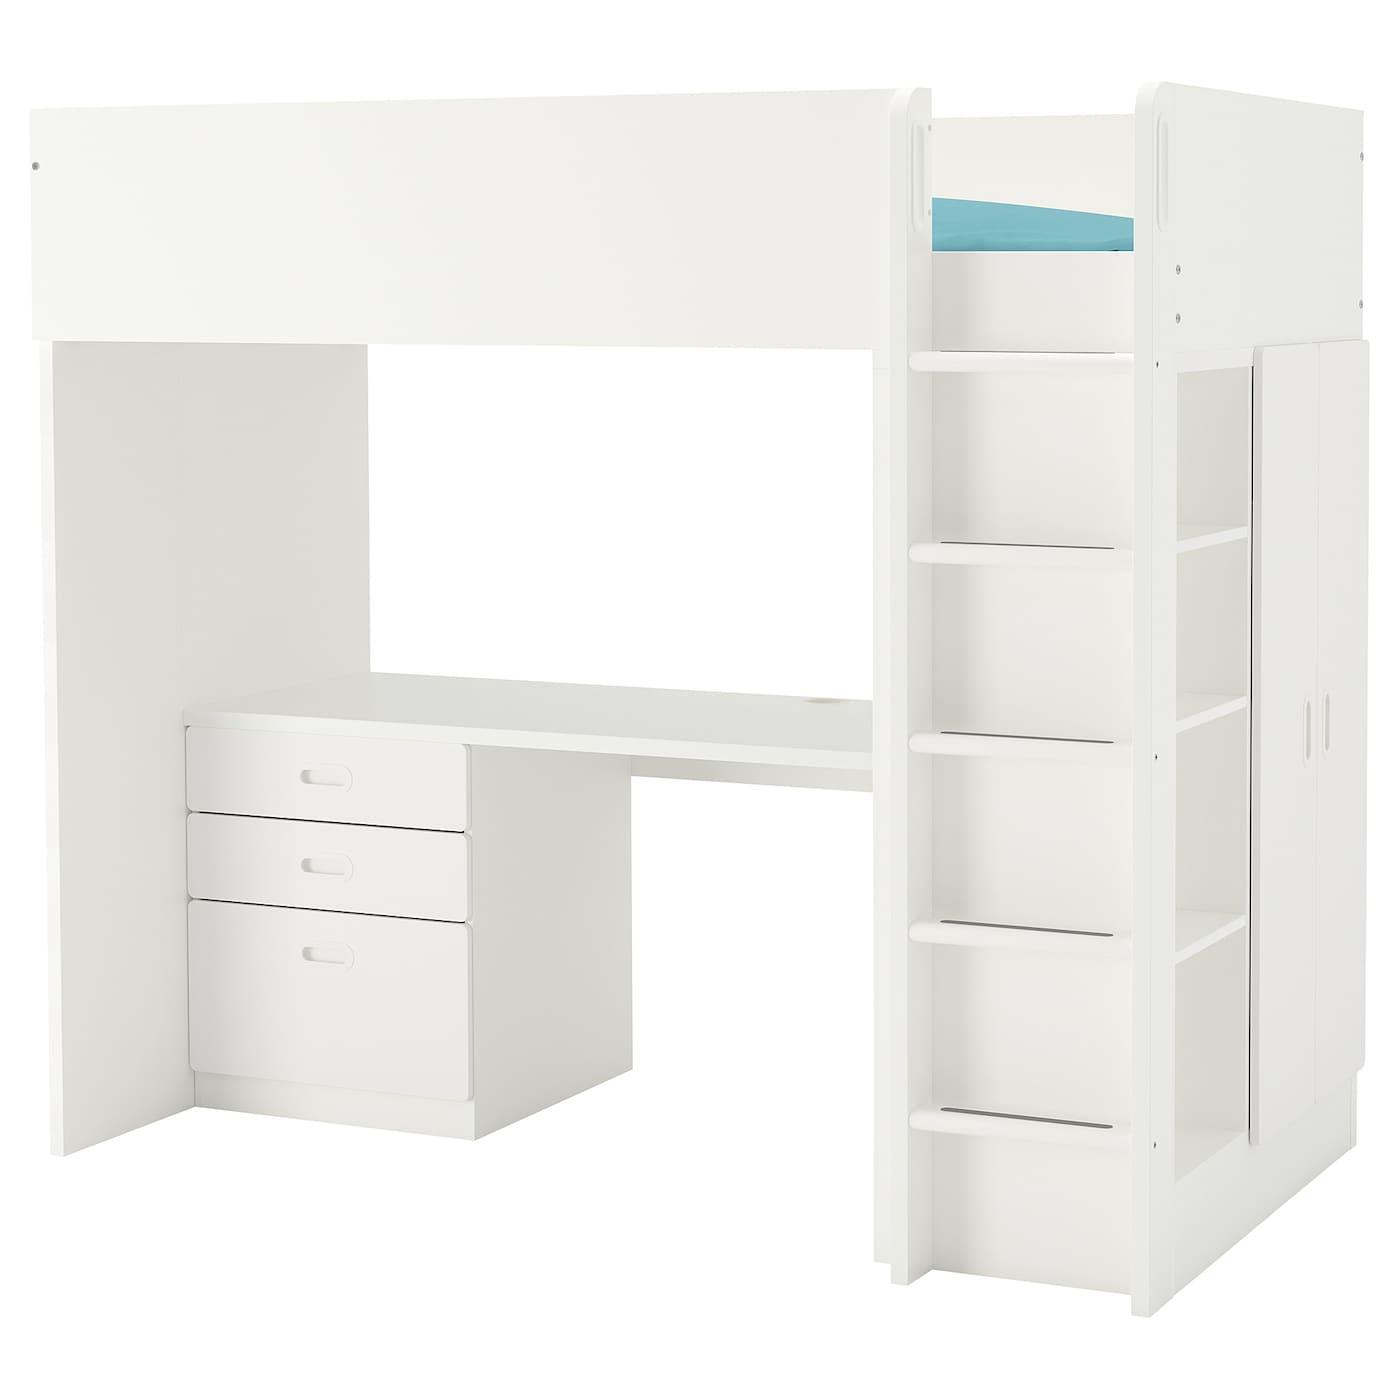 meubles design et d coration ikea. Black Bedroom Furniture Sets. Home Design Ideas